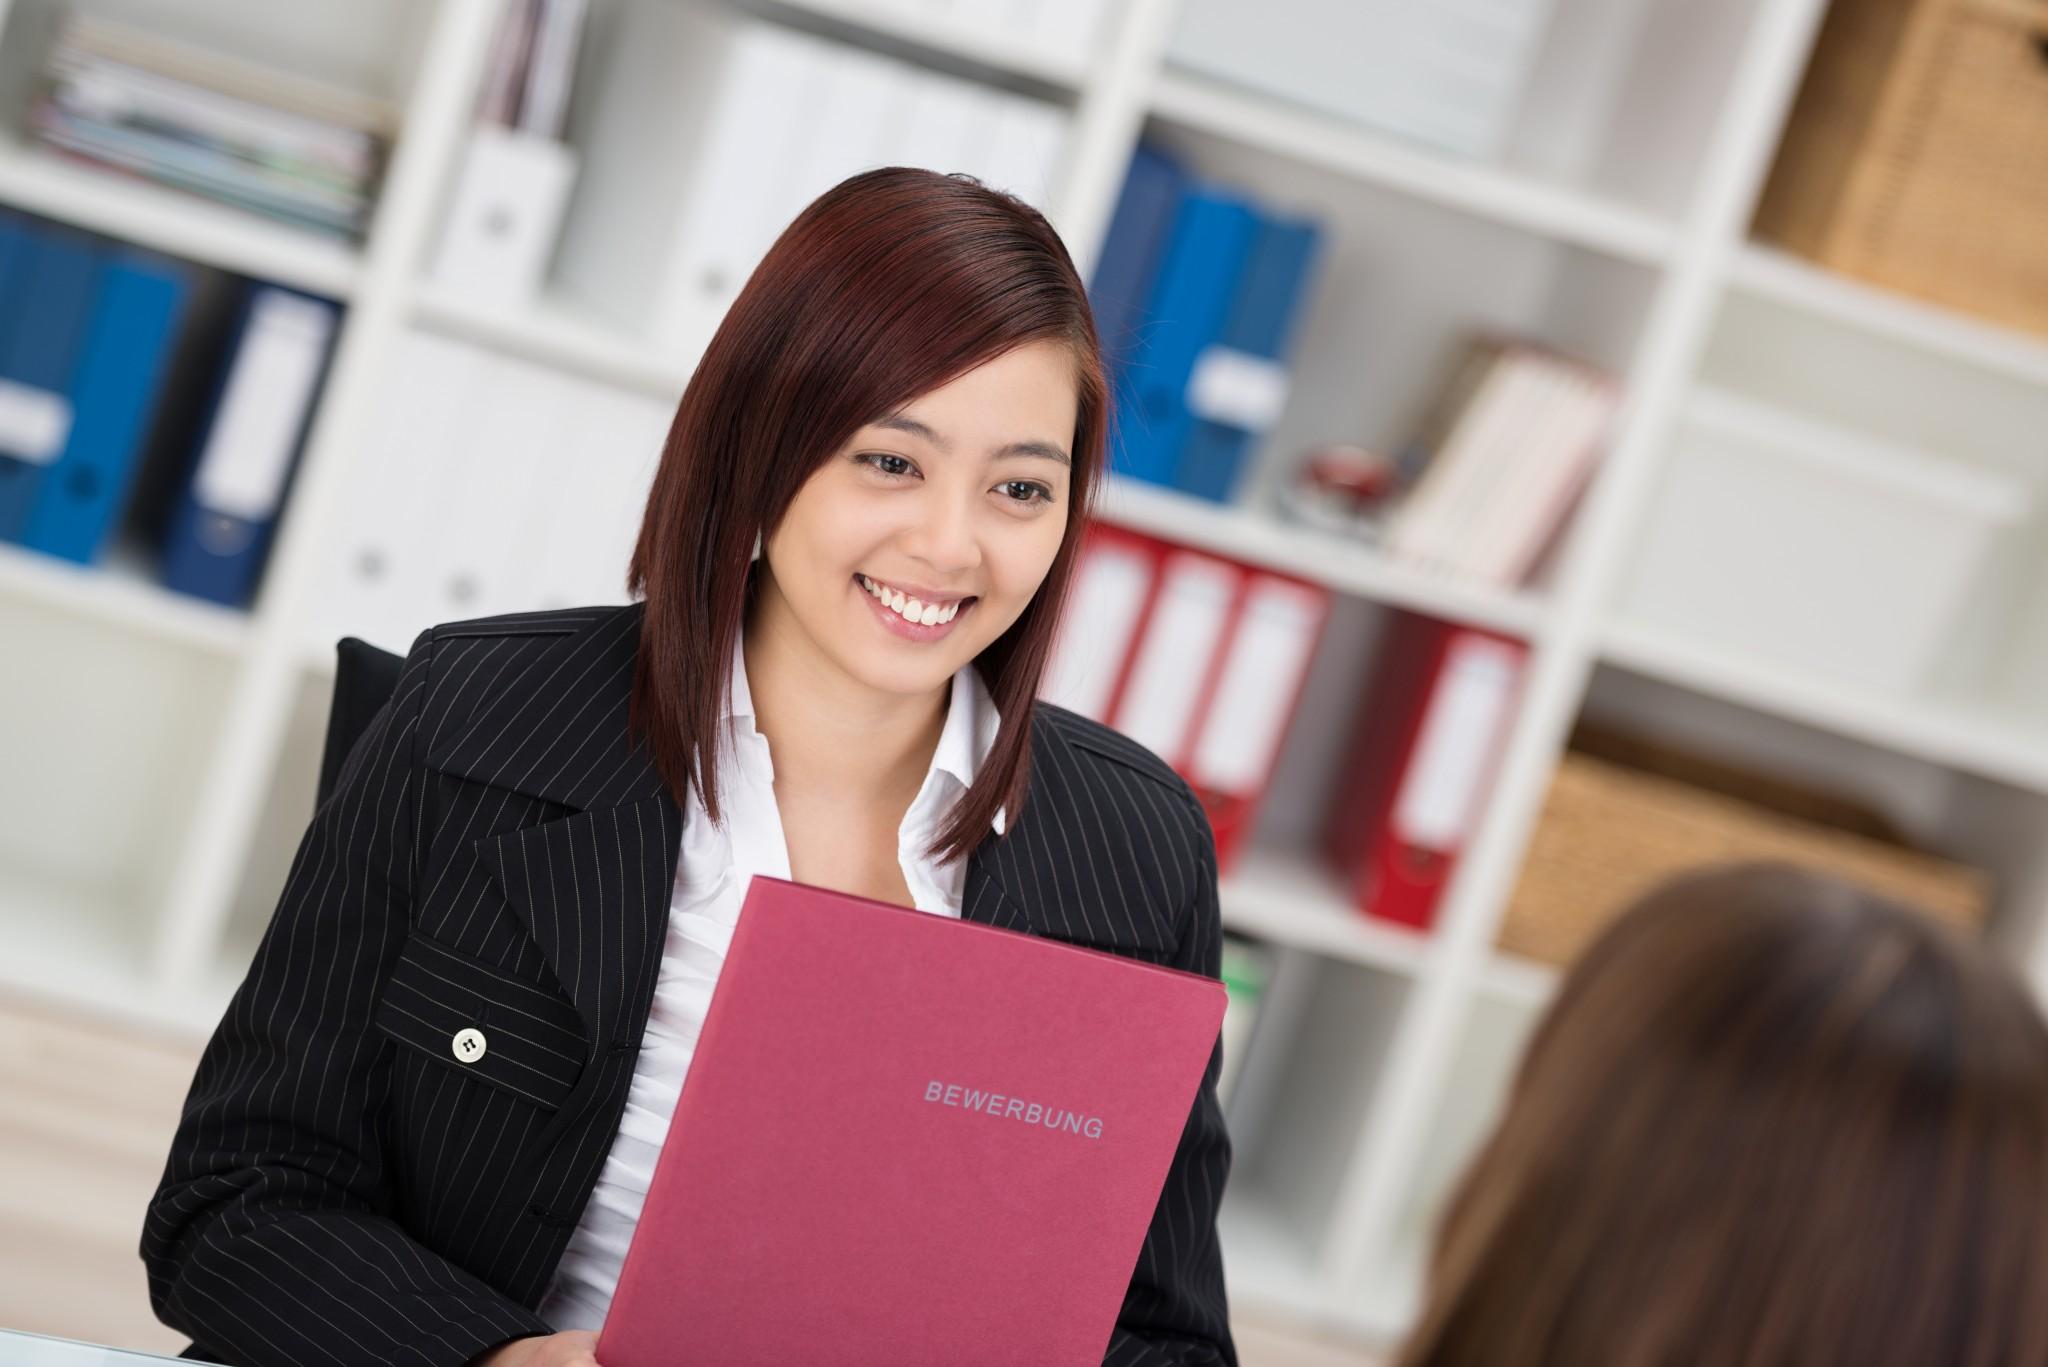 employment_prospects_international_students.jpg